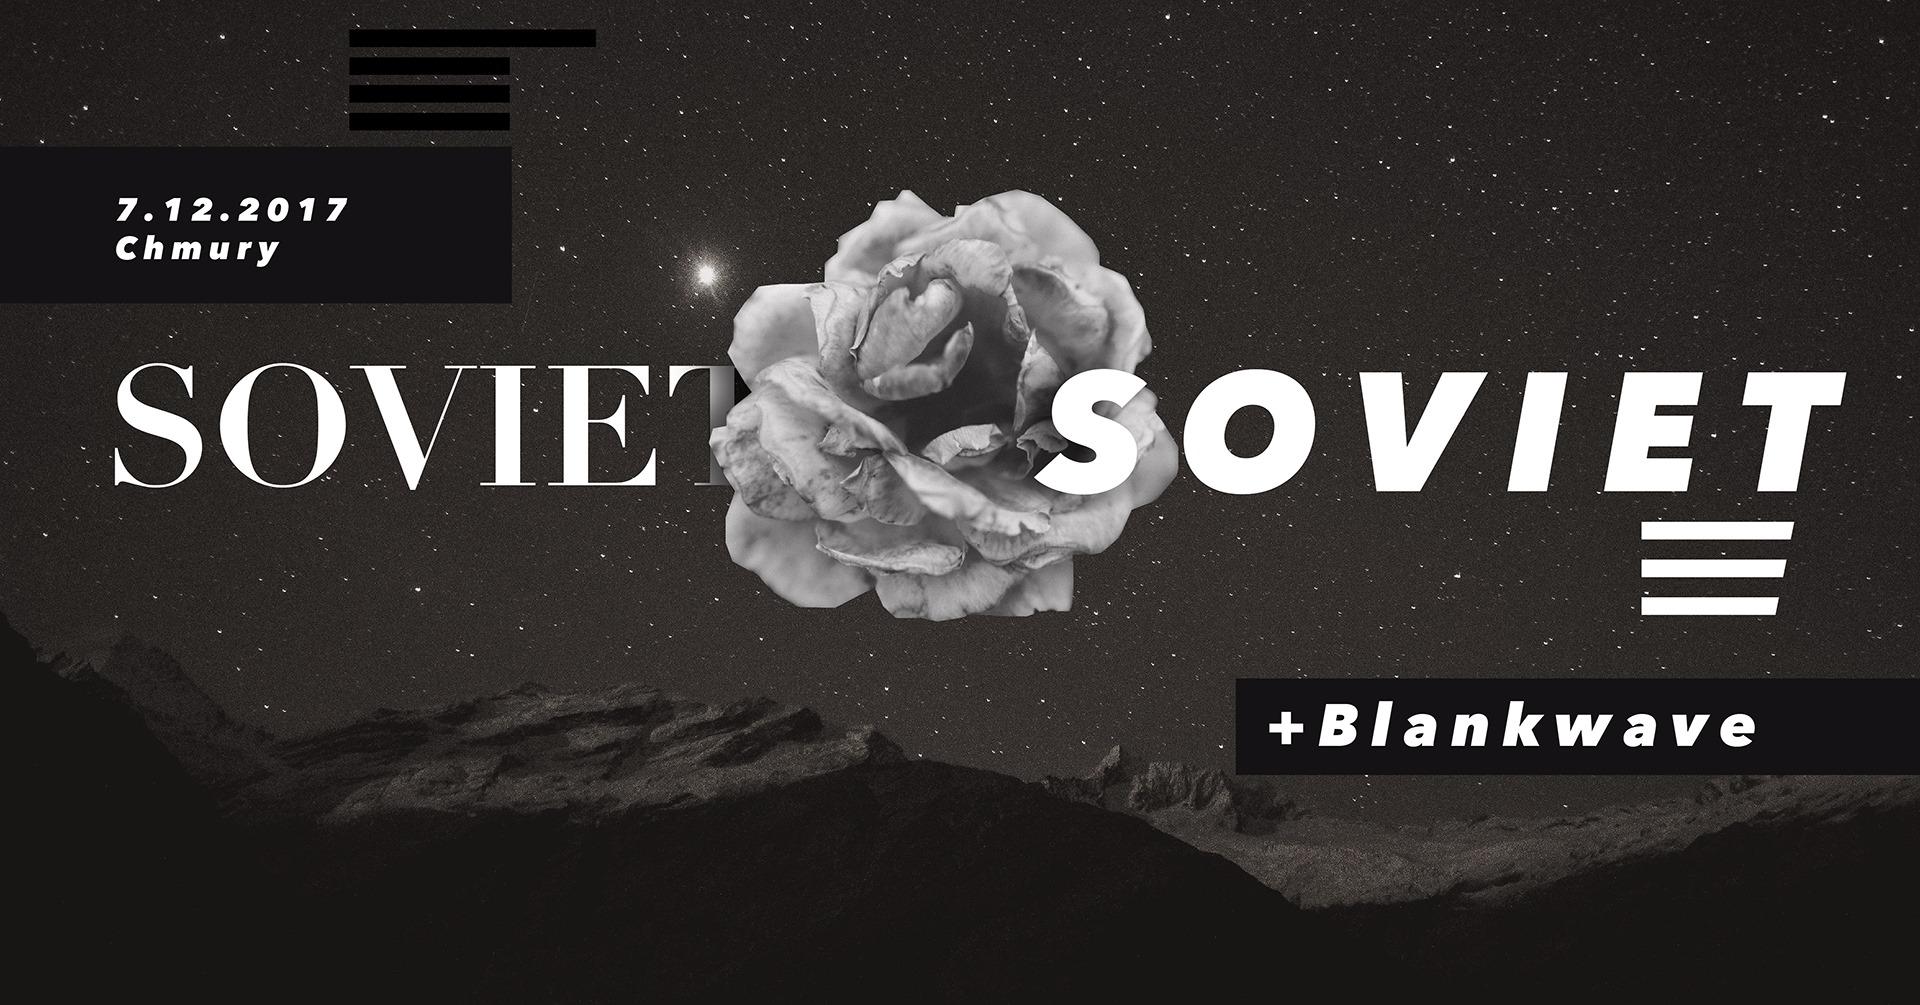 Soviet Soviet - Blanckwave (Chmury - Warszawa - 07.12.2017)